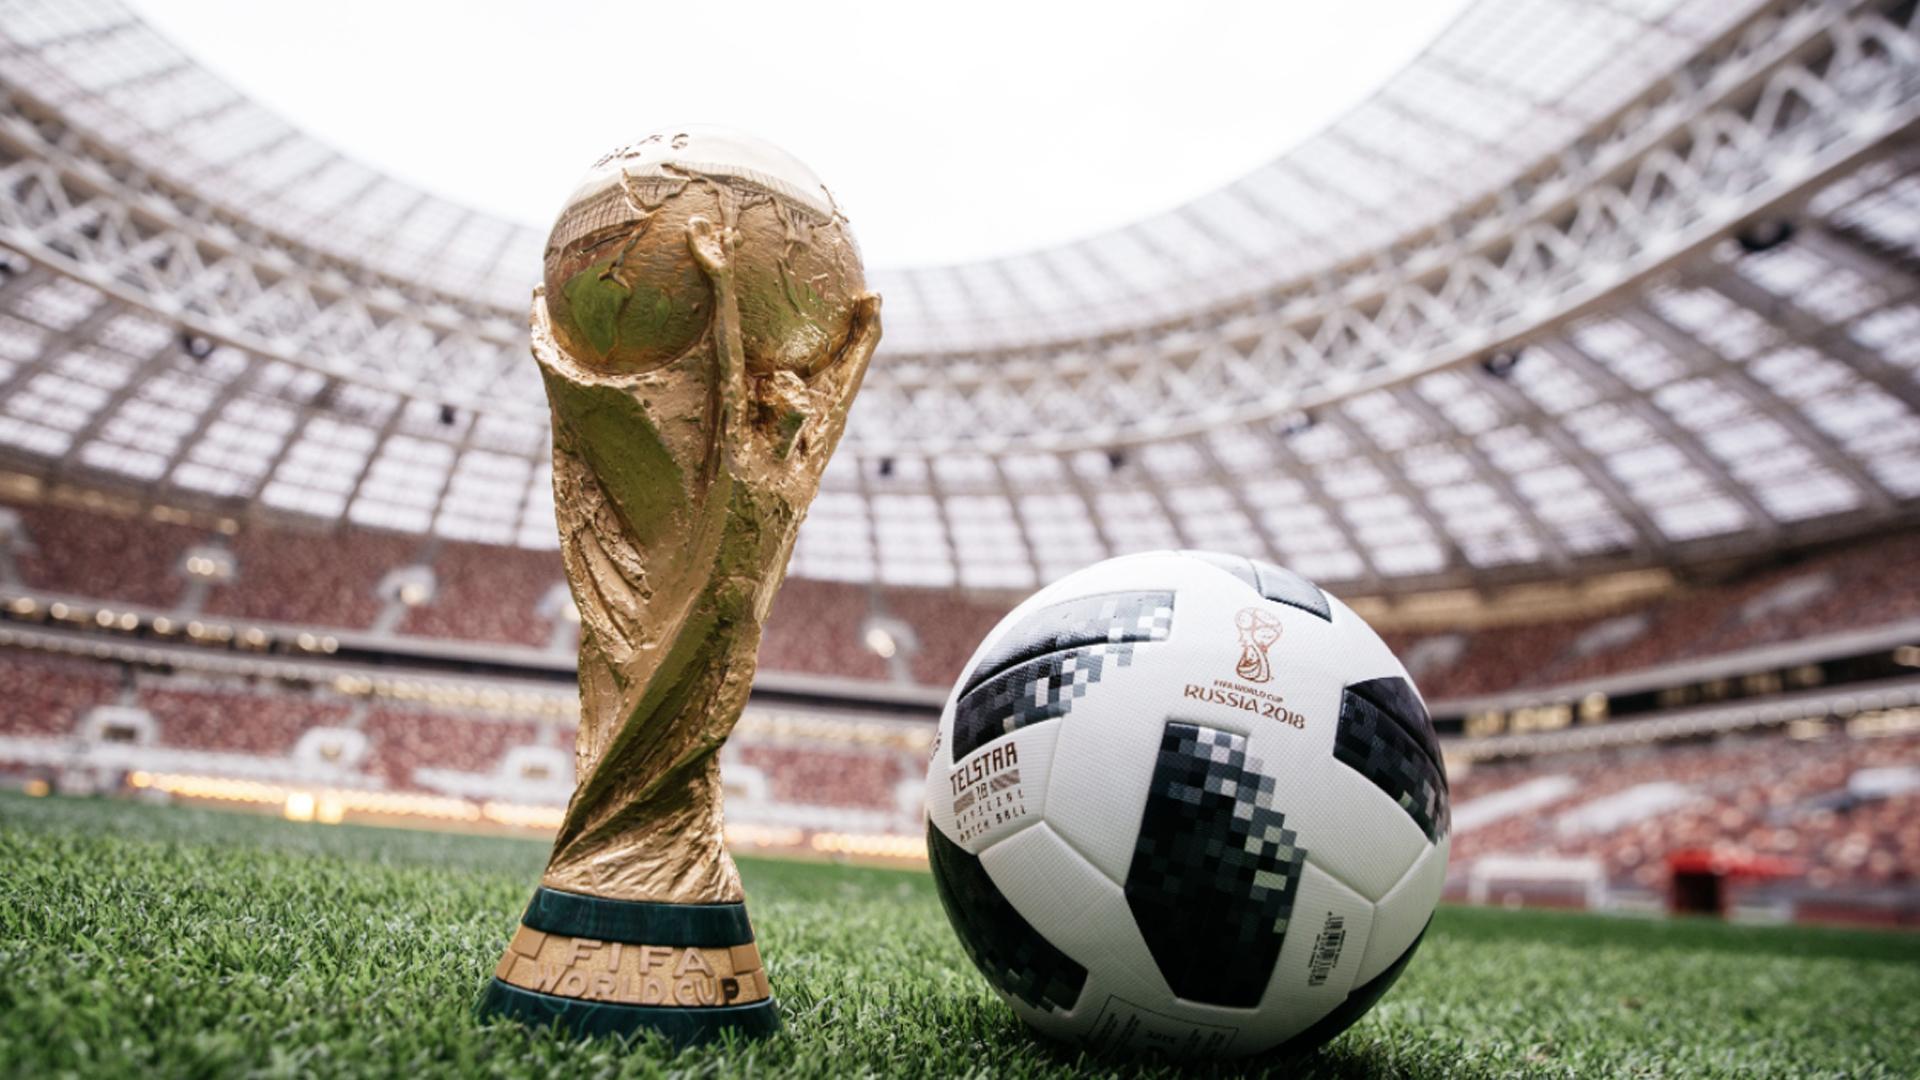 Jadwal Lengkap Piala Dunia / World Cup 2018